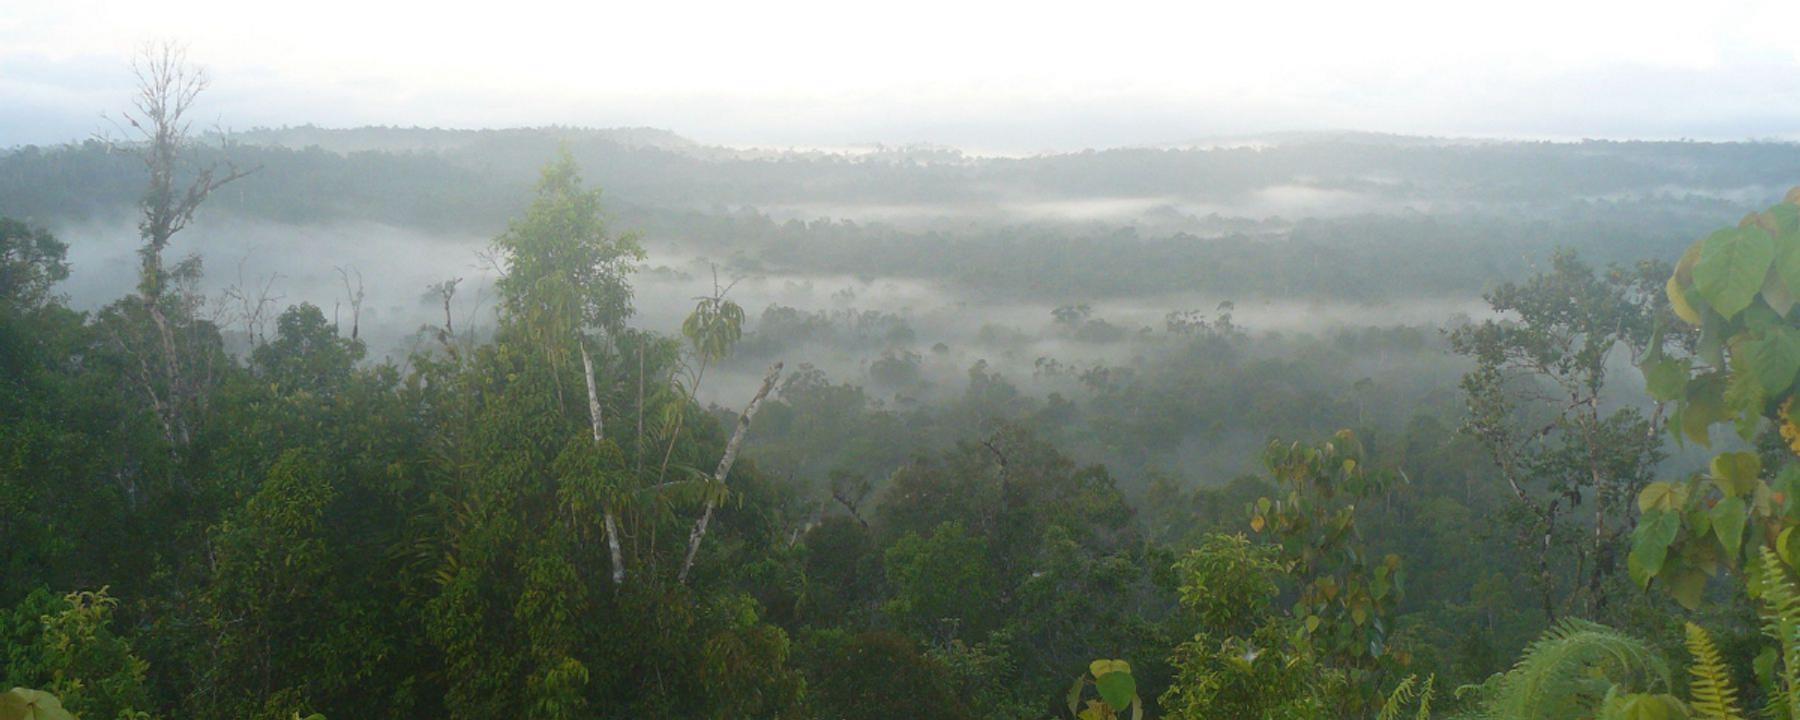 Ten Bird Species Newly Identified on Indonesian Islands